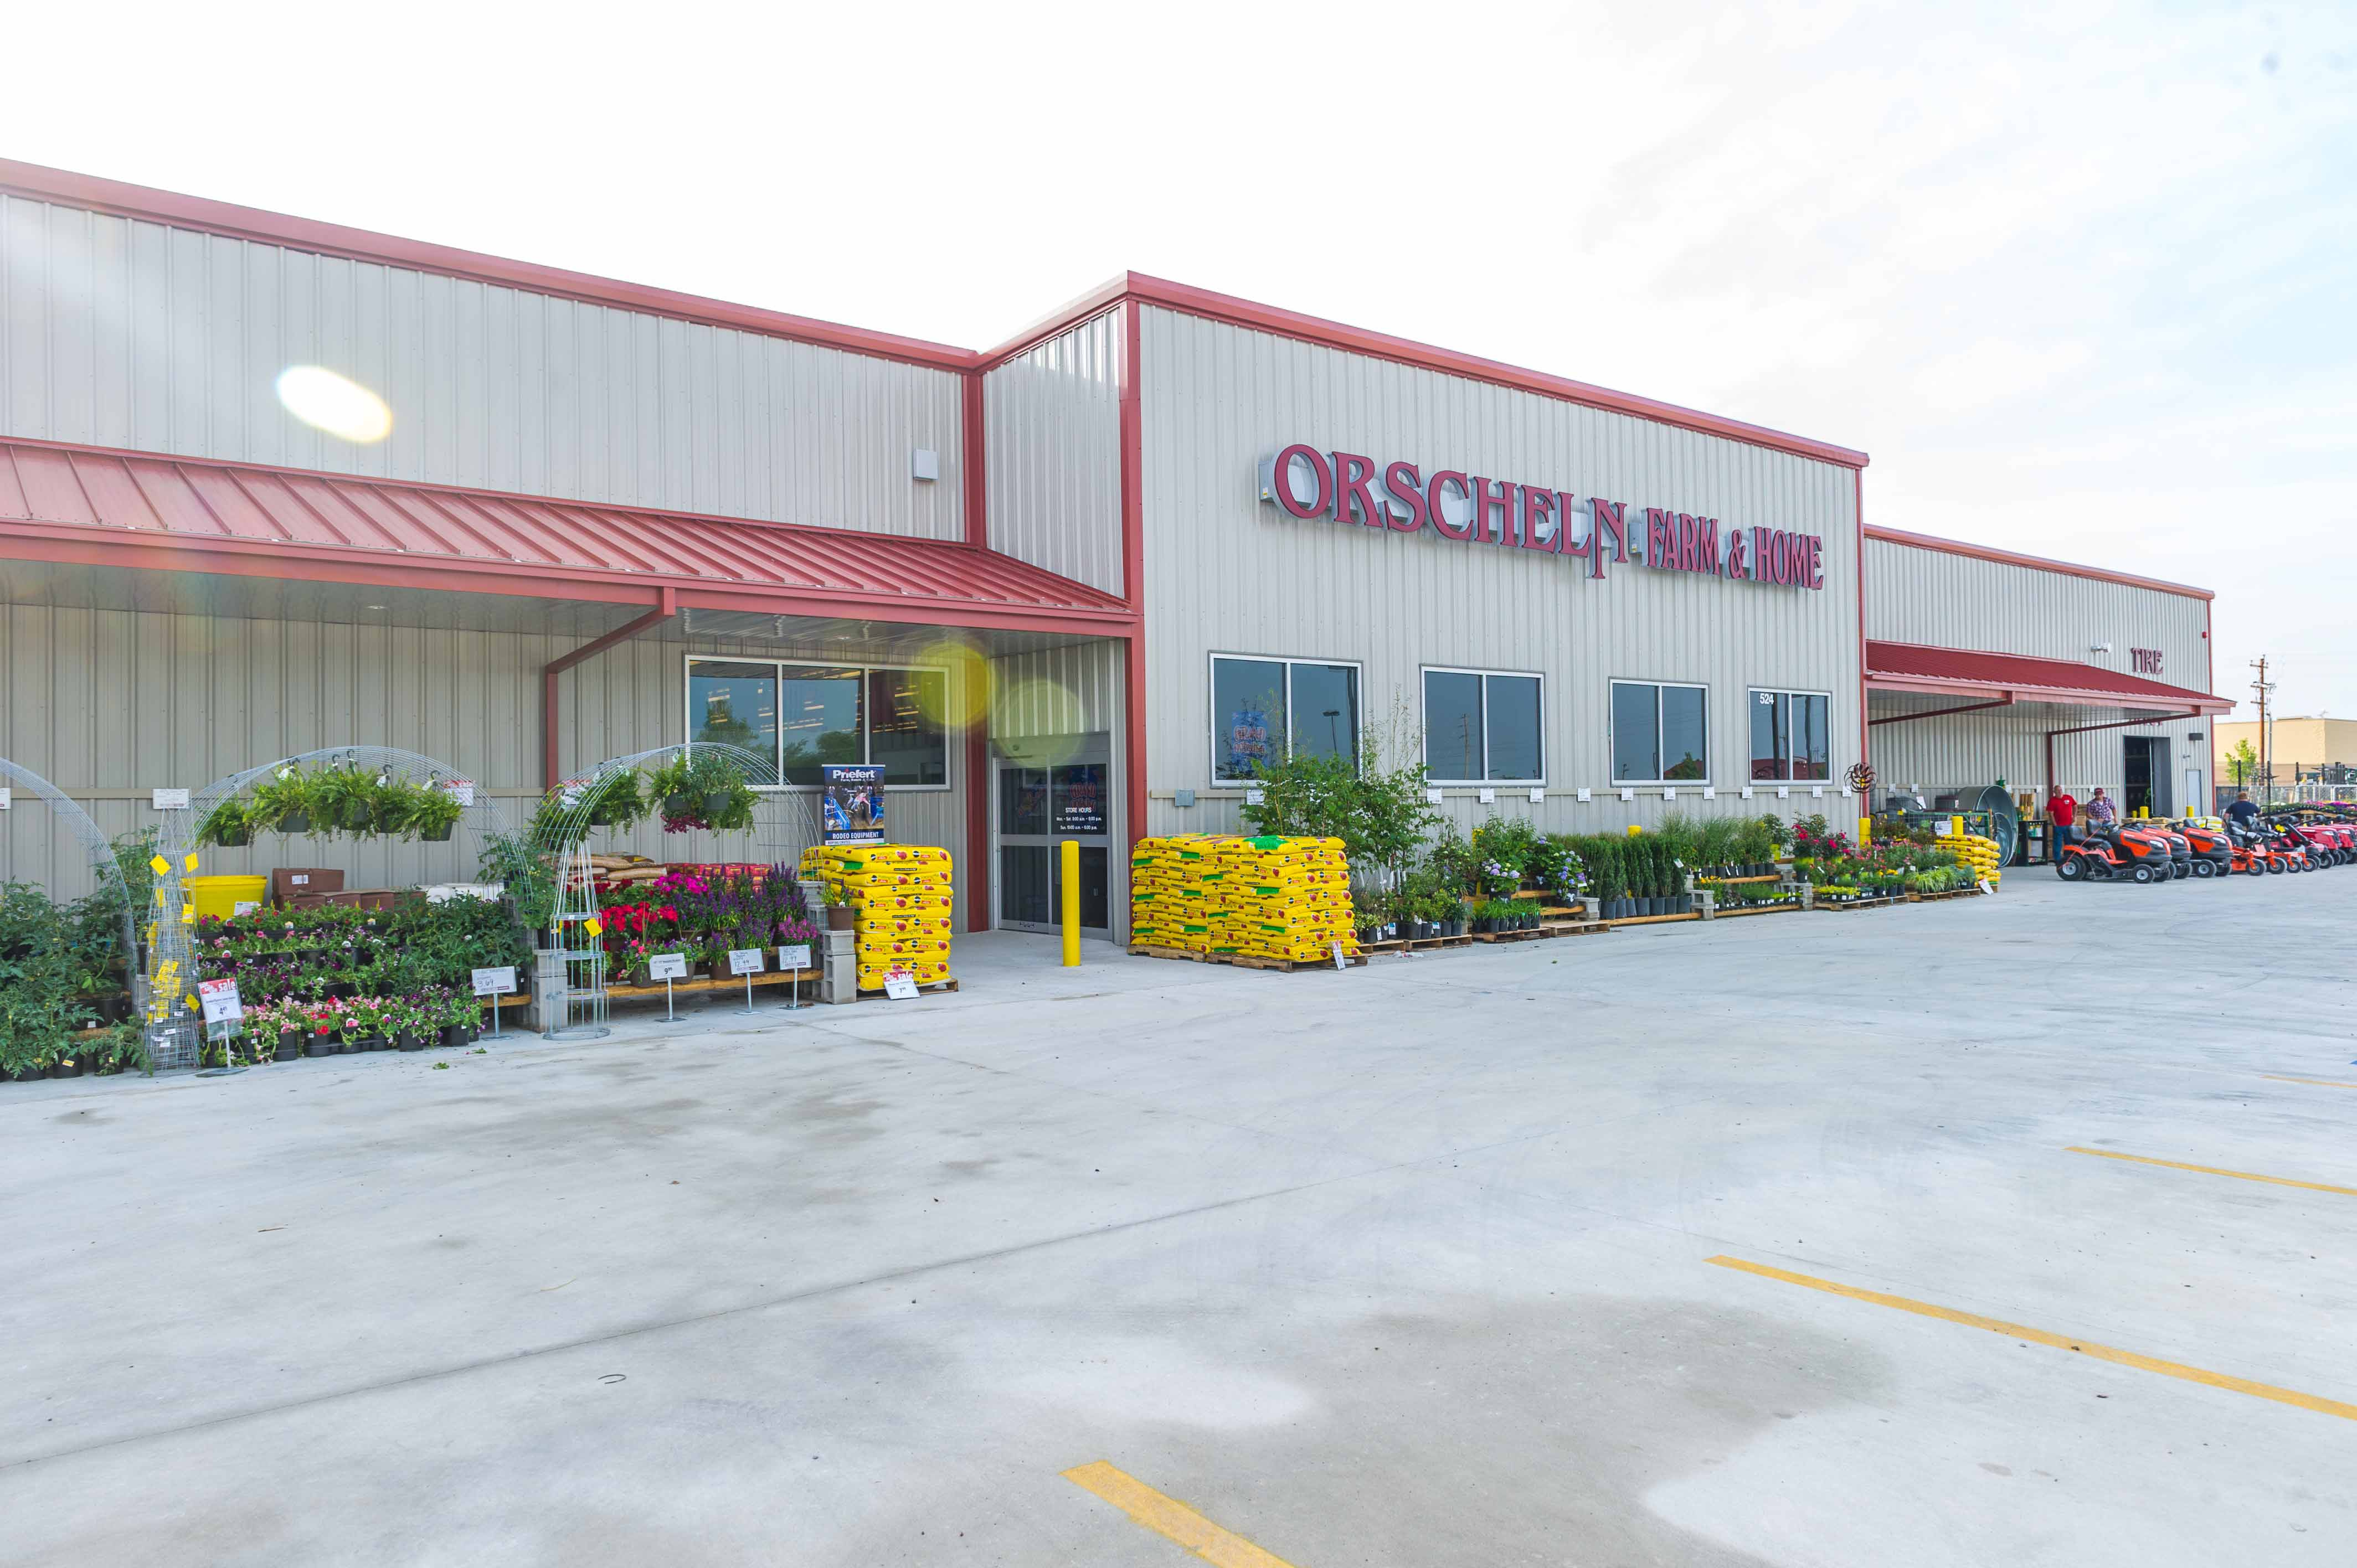 Front view of Orscheln Farm & Home Store in Trumann, Arkansas 72472